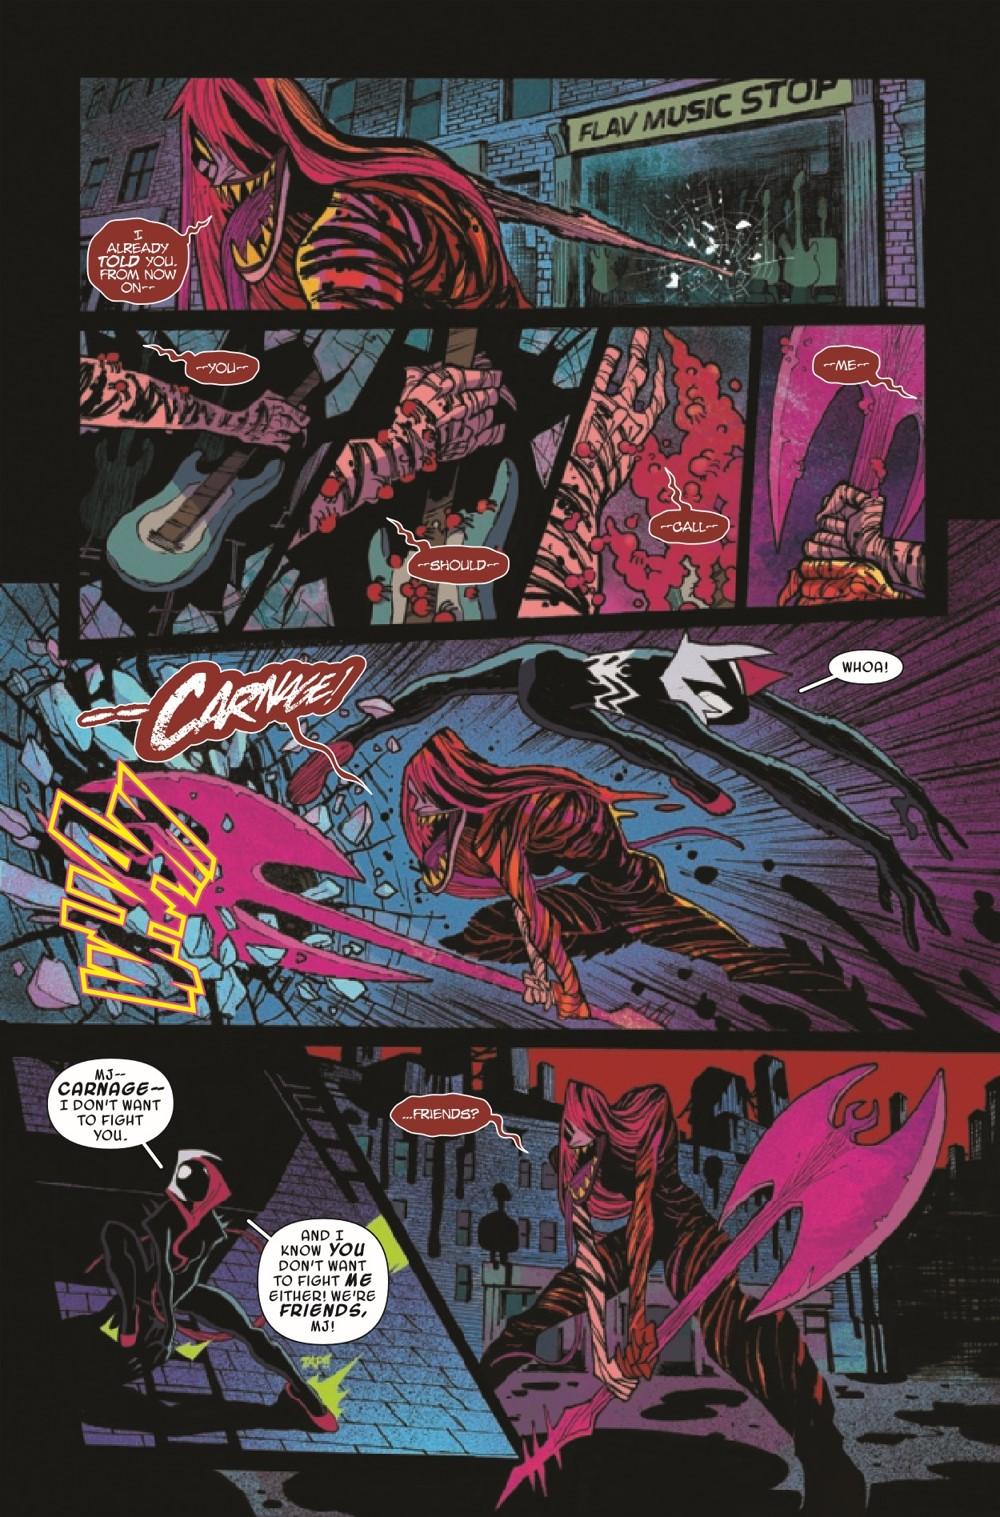 GWENOMVSCARNKIB2021002_Preview-5 ComicList Previews: KING IN BLACK GWENOM VS CARNAGE #2 (OF 3)